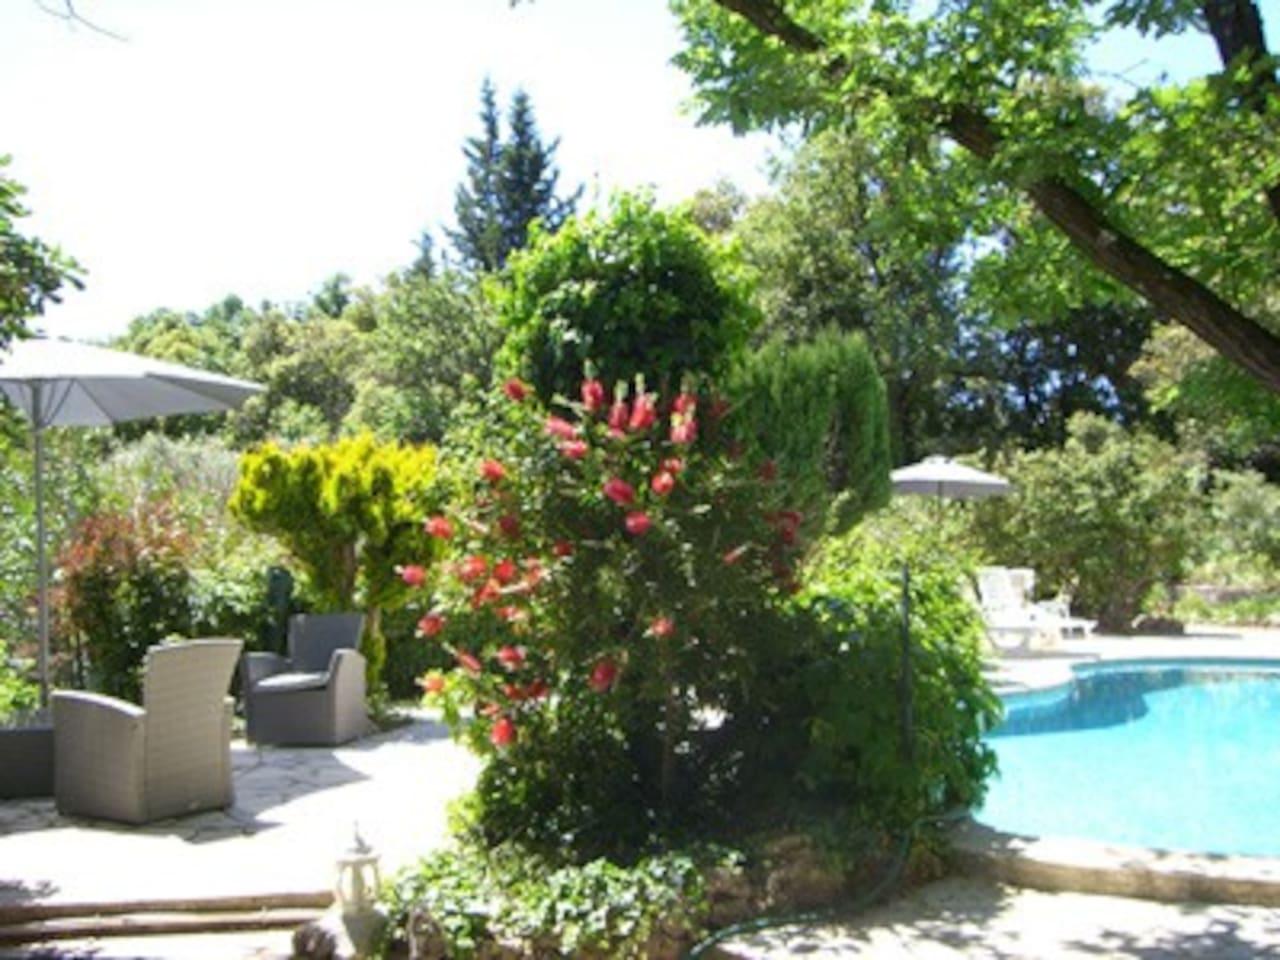 terrace with garden furnitures